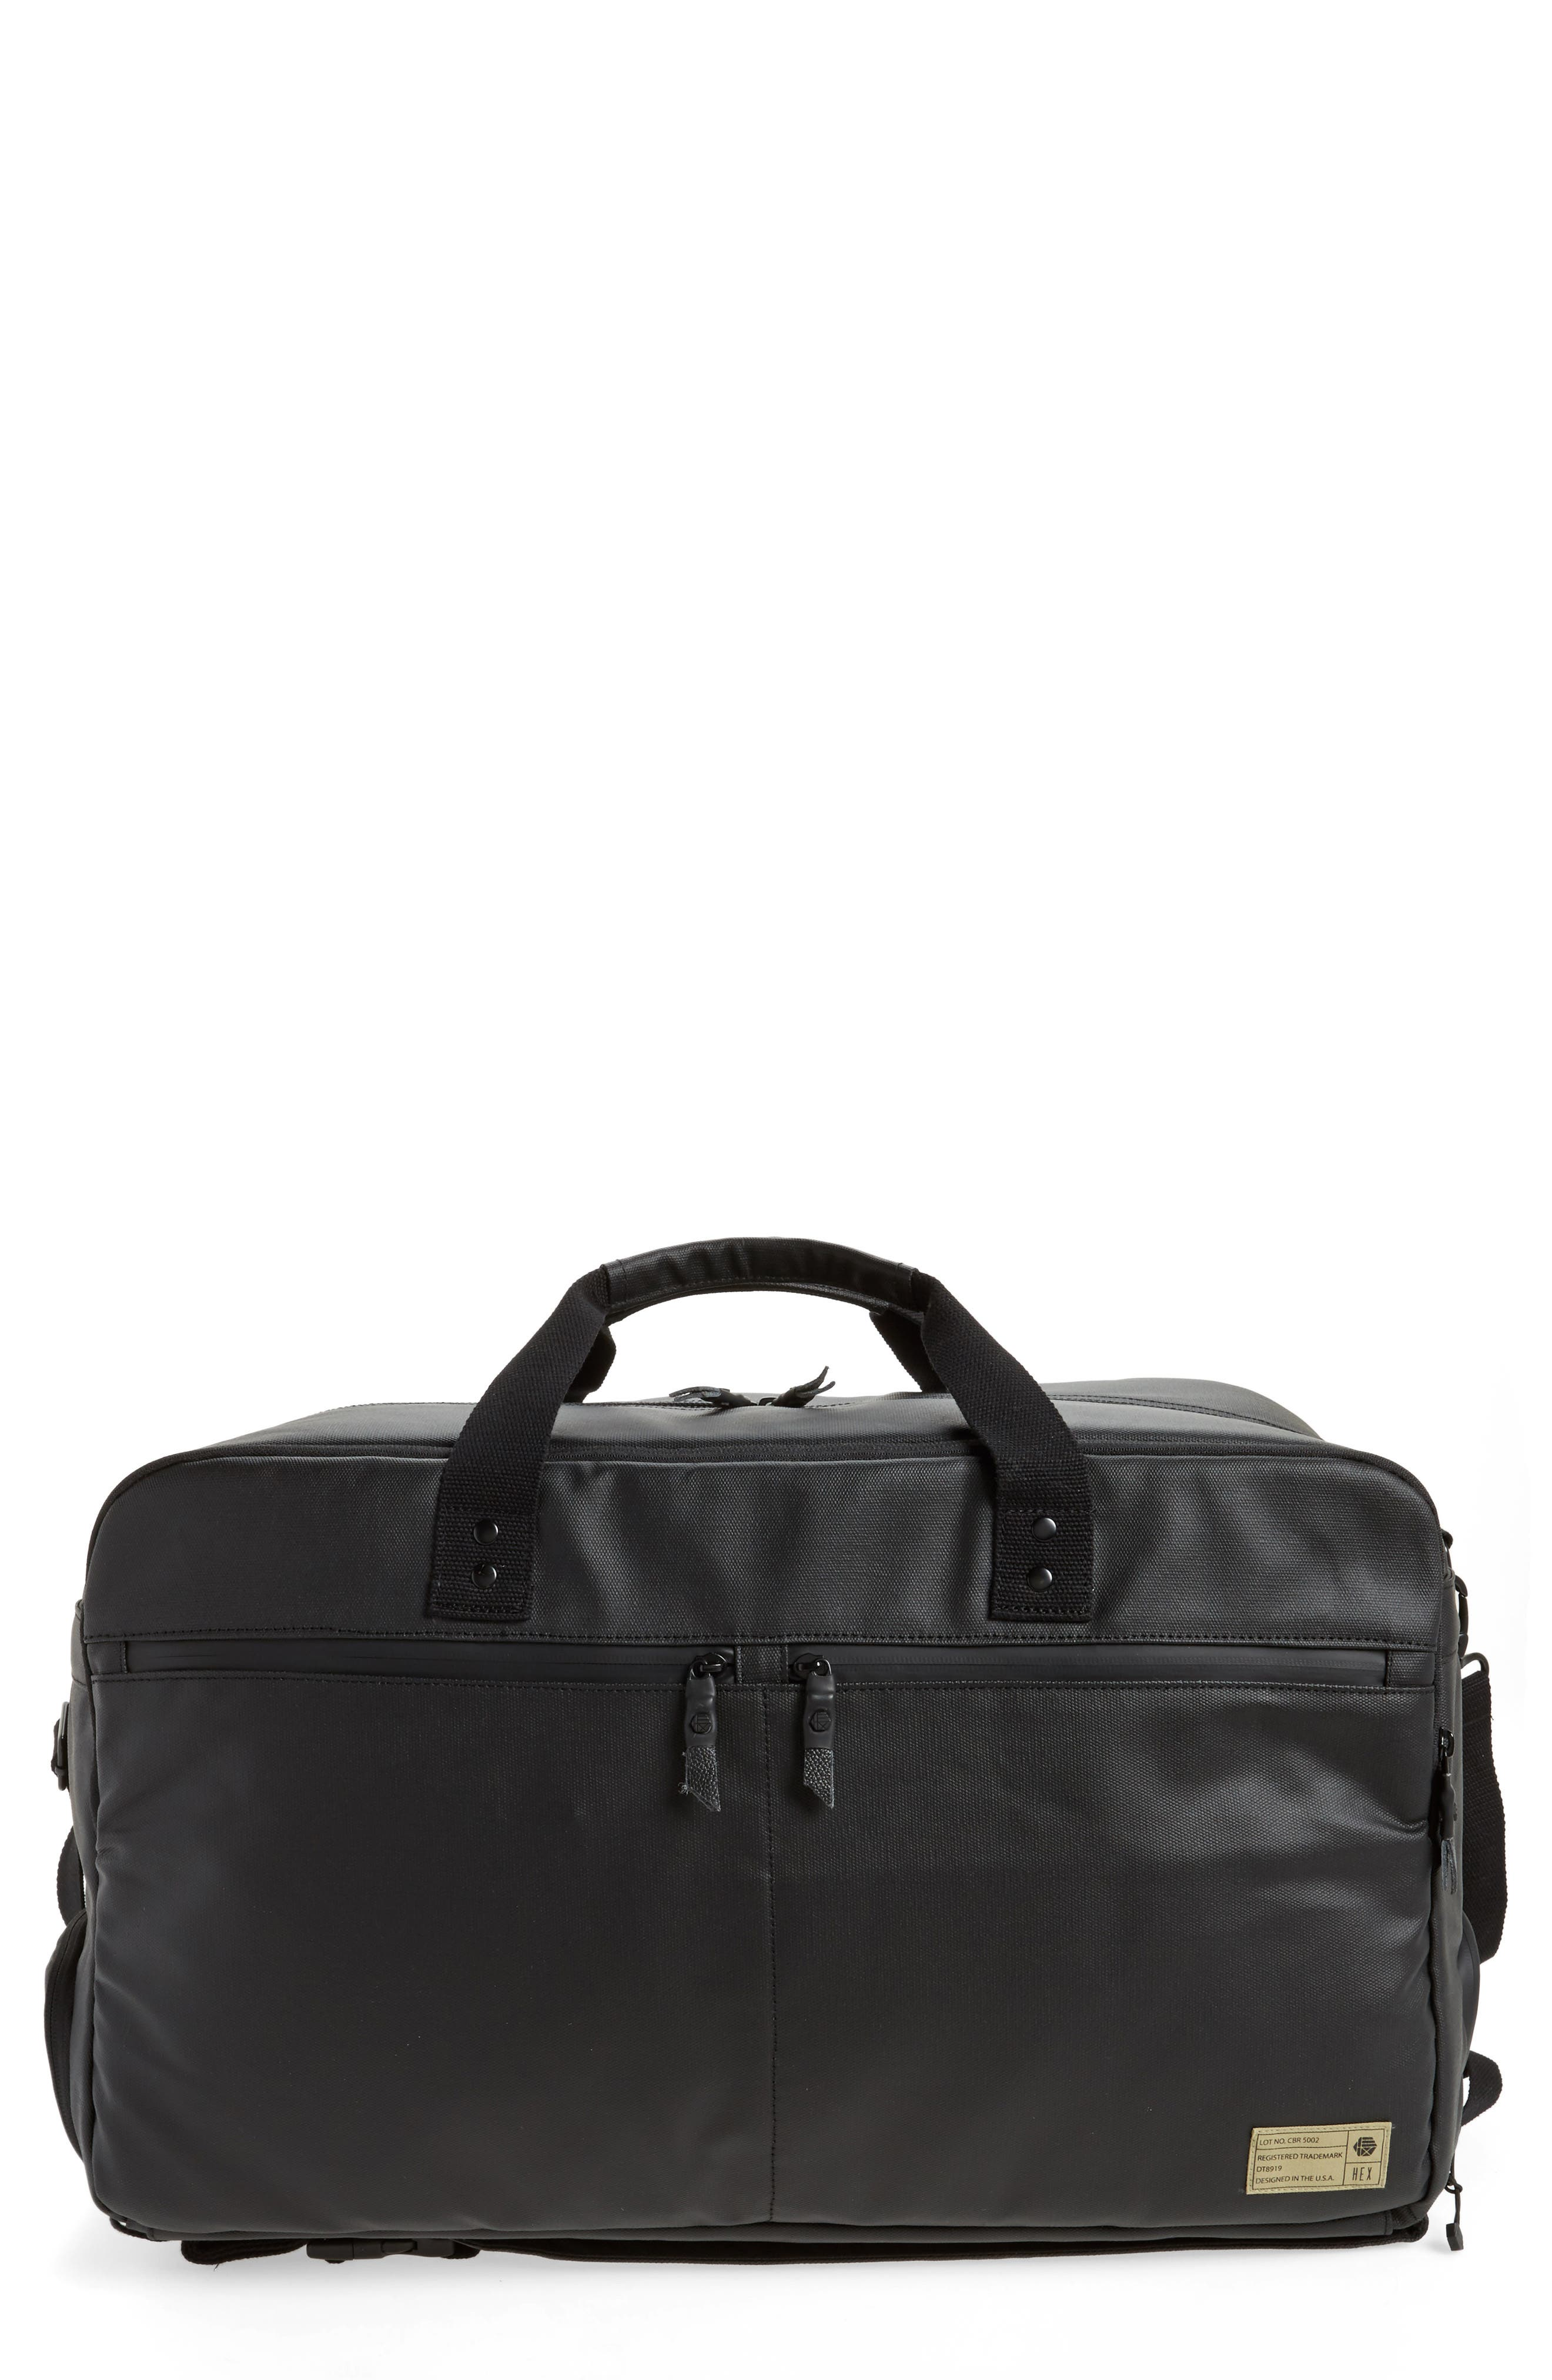 HEX Convertible Duffel Bag